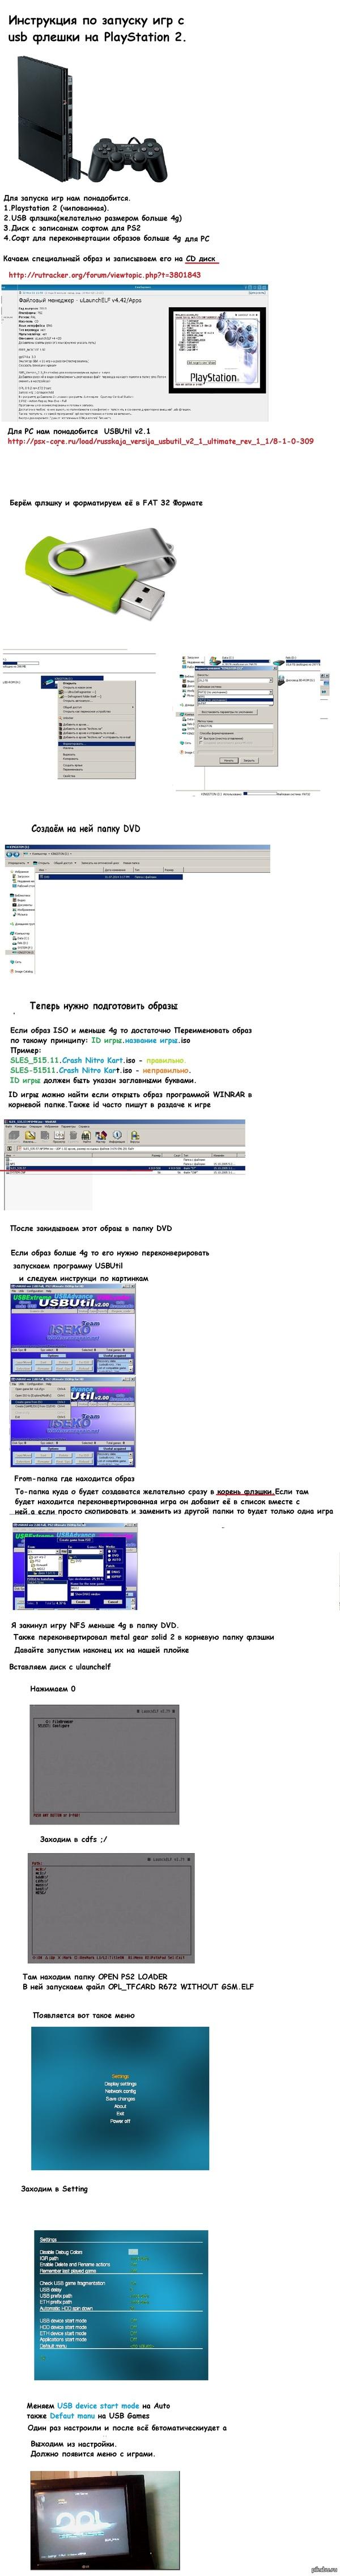 как запускать игры с usb флэшки на Playstation 2 USBUtil v2.1 http://psx-core.ru/load/russkaja_versija_usbutil_v2_1_ultimate_rev_1_1/8-1-0-309